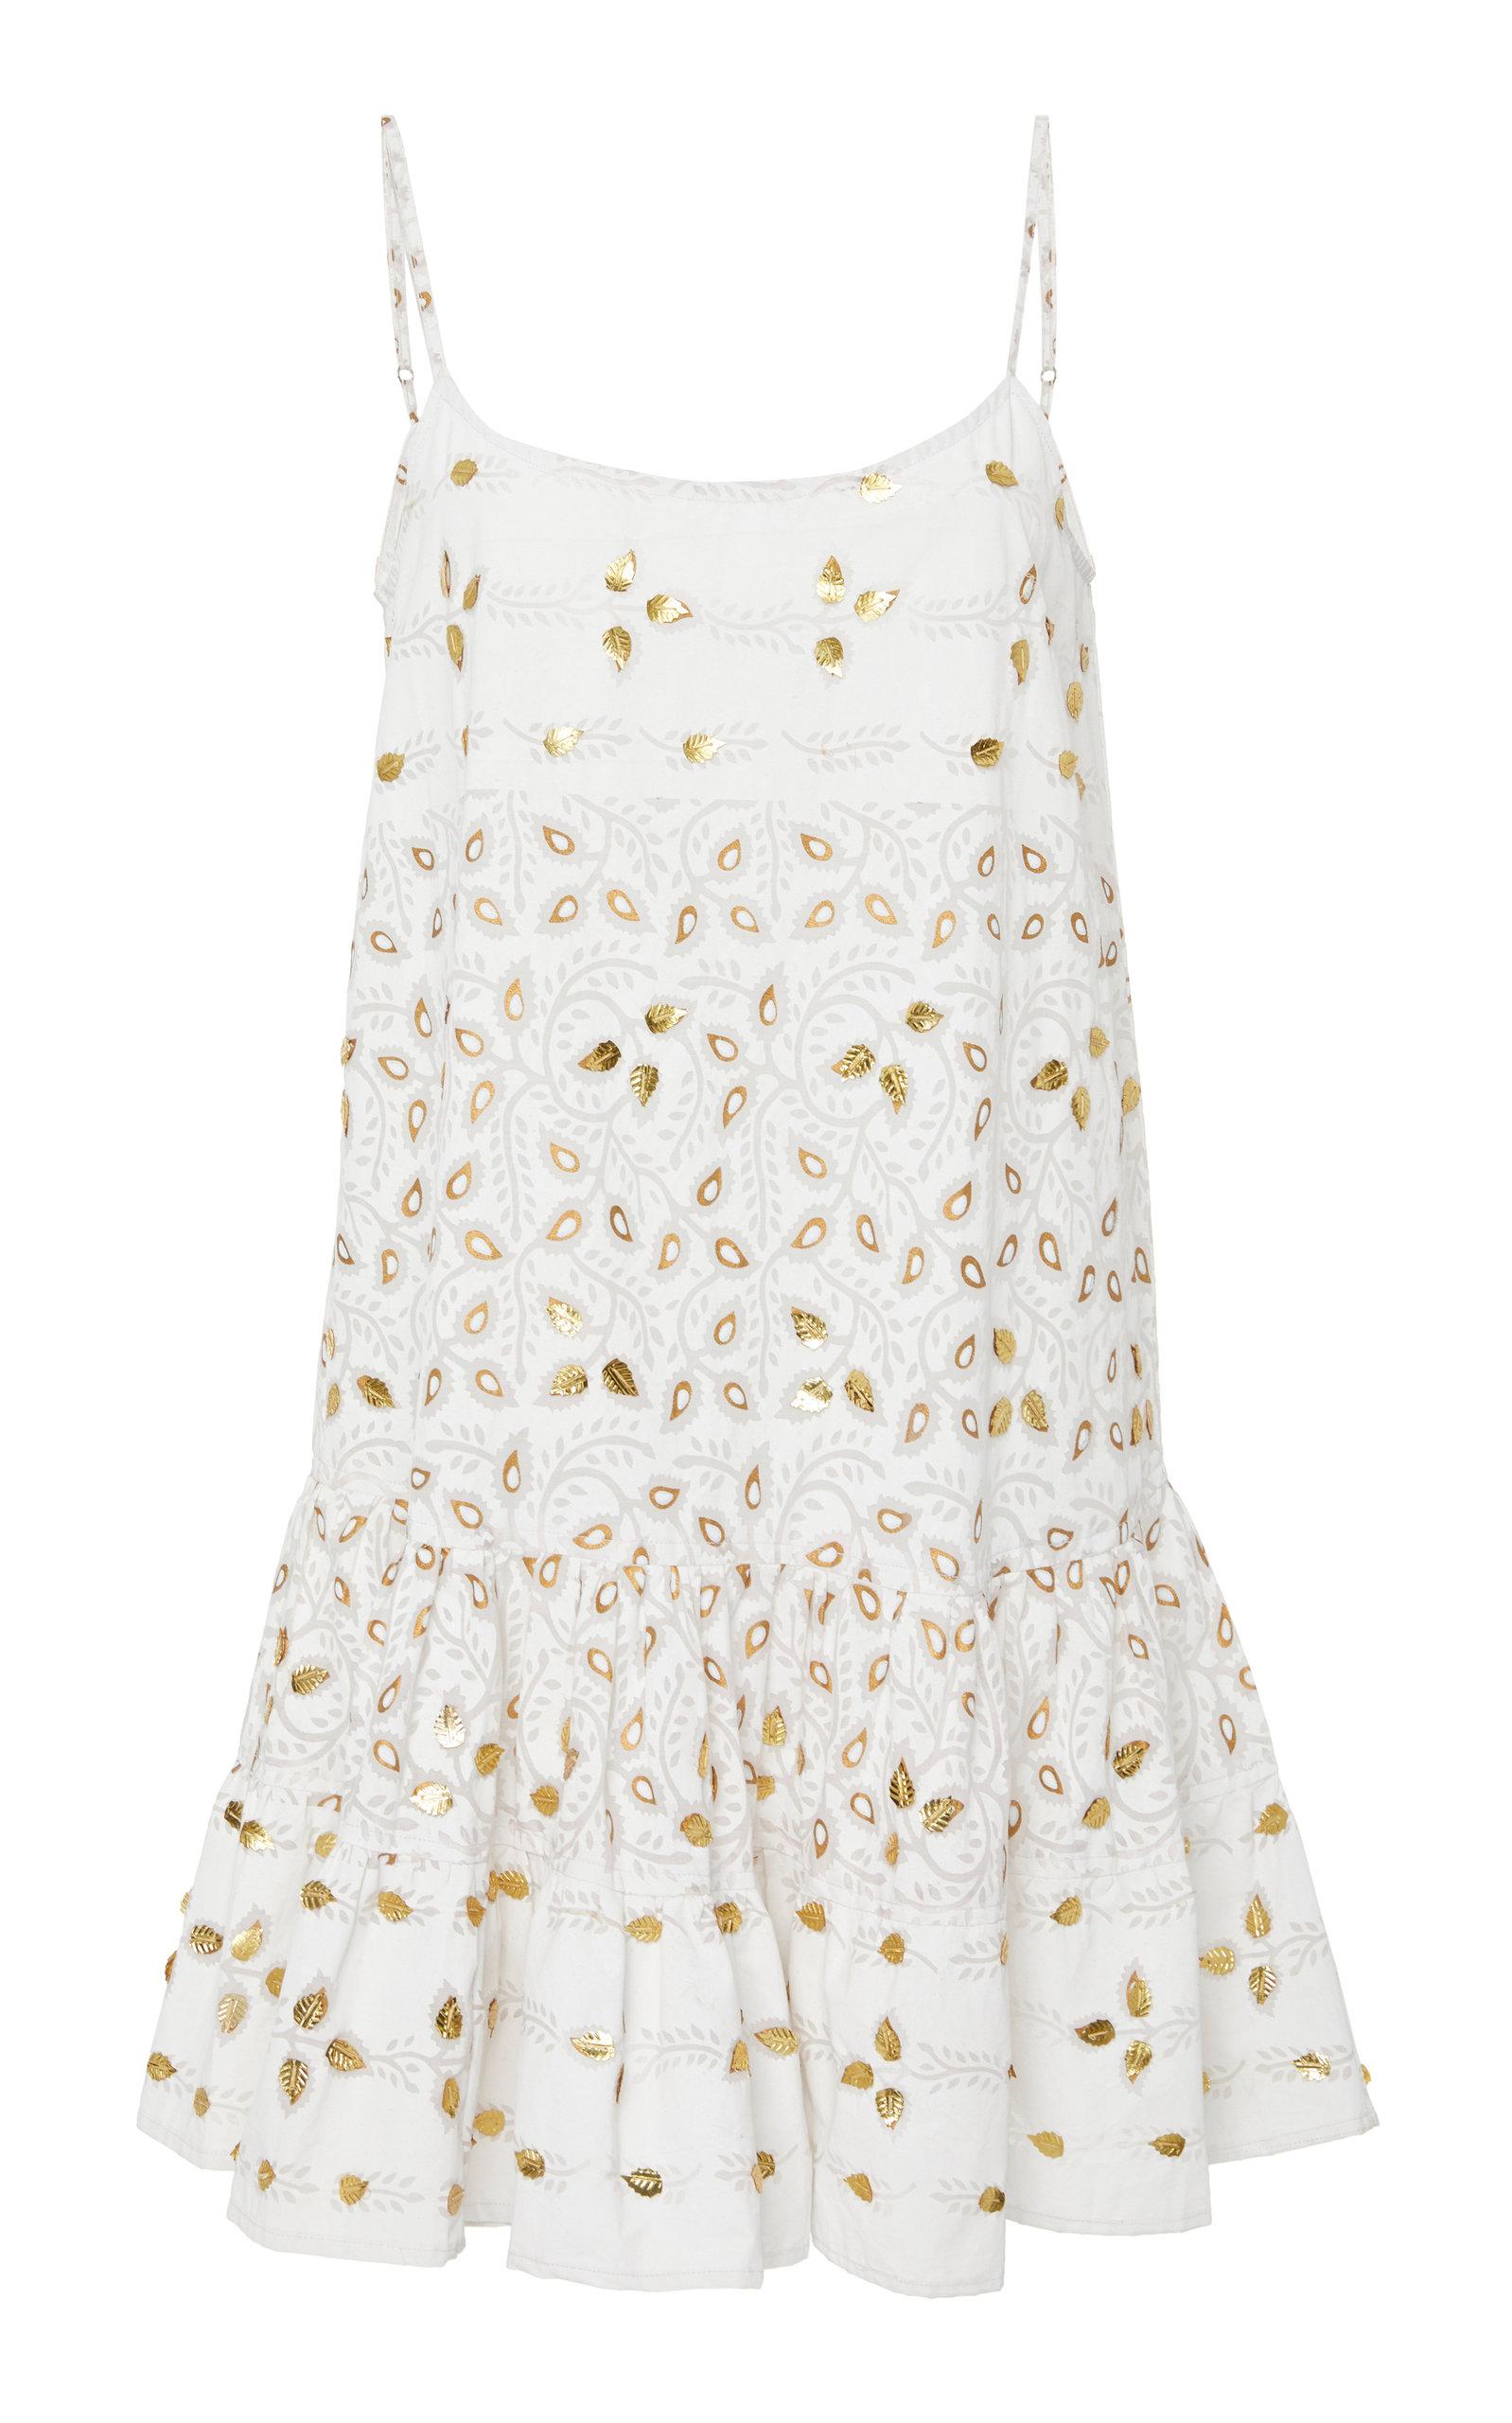 JULIET DUNN EMBELLISHED COTTON CAMISOLE DRESS